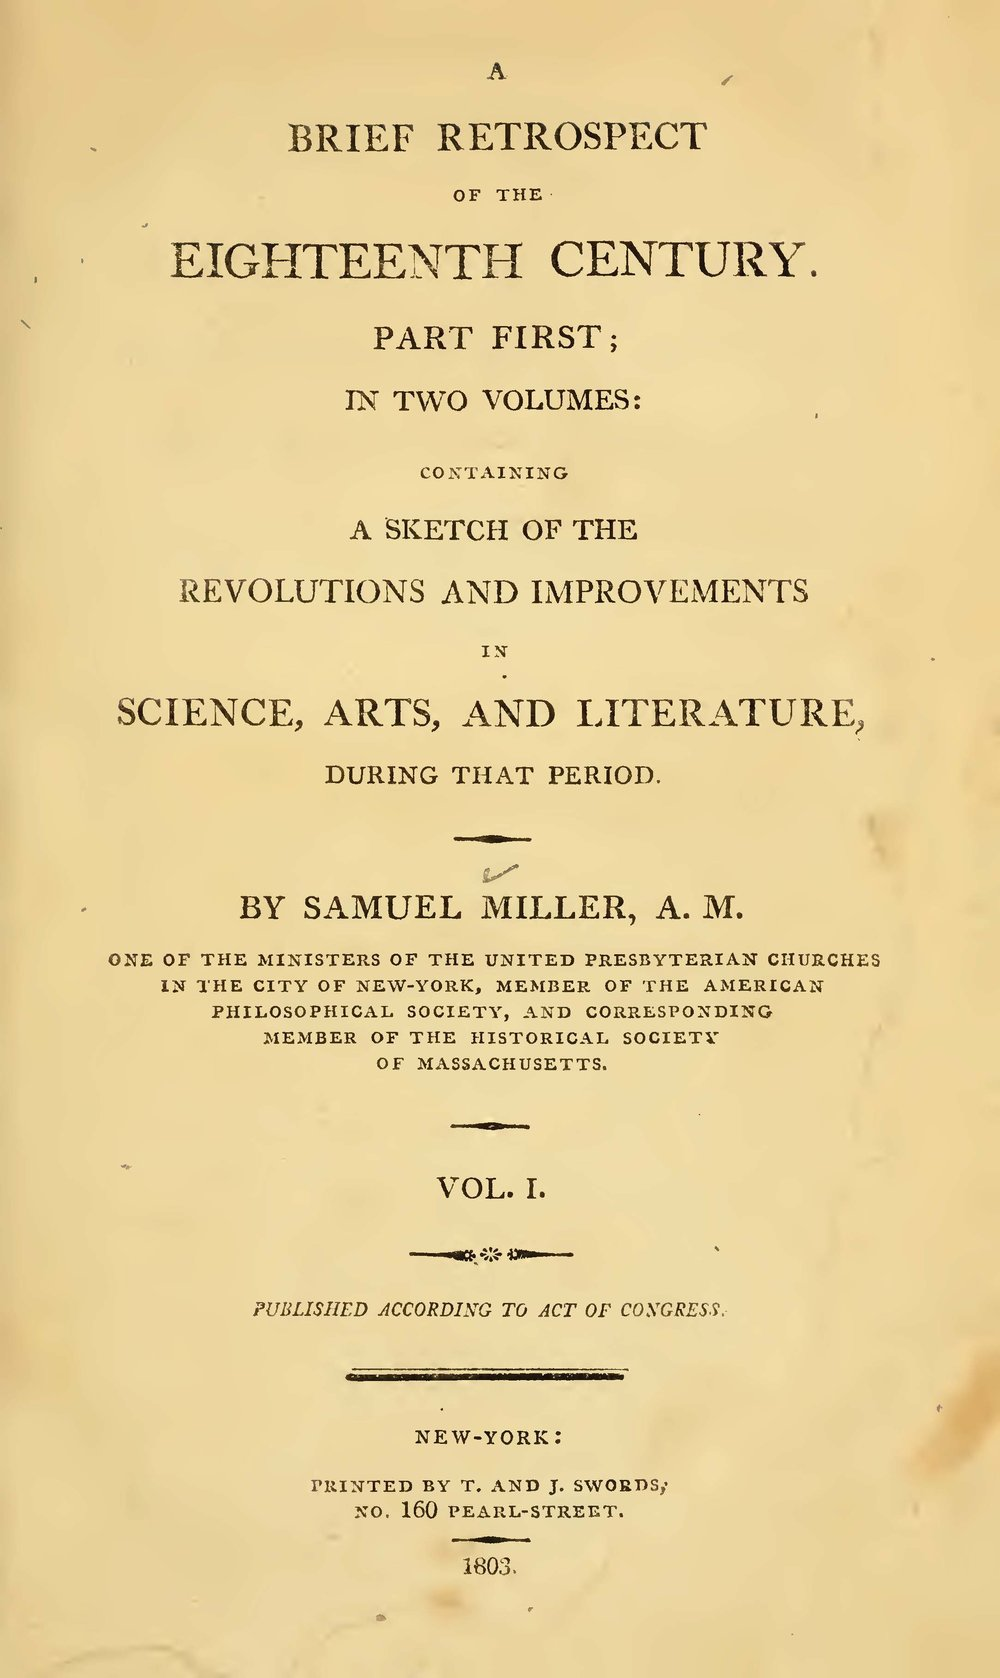 Miller, Samuel, A Brief Retrospect of the Eighteenth Century, Vol. 1 Title Page.jpg